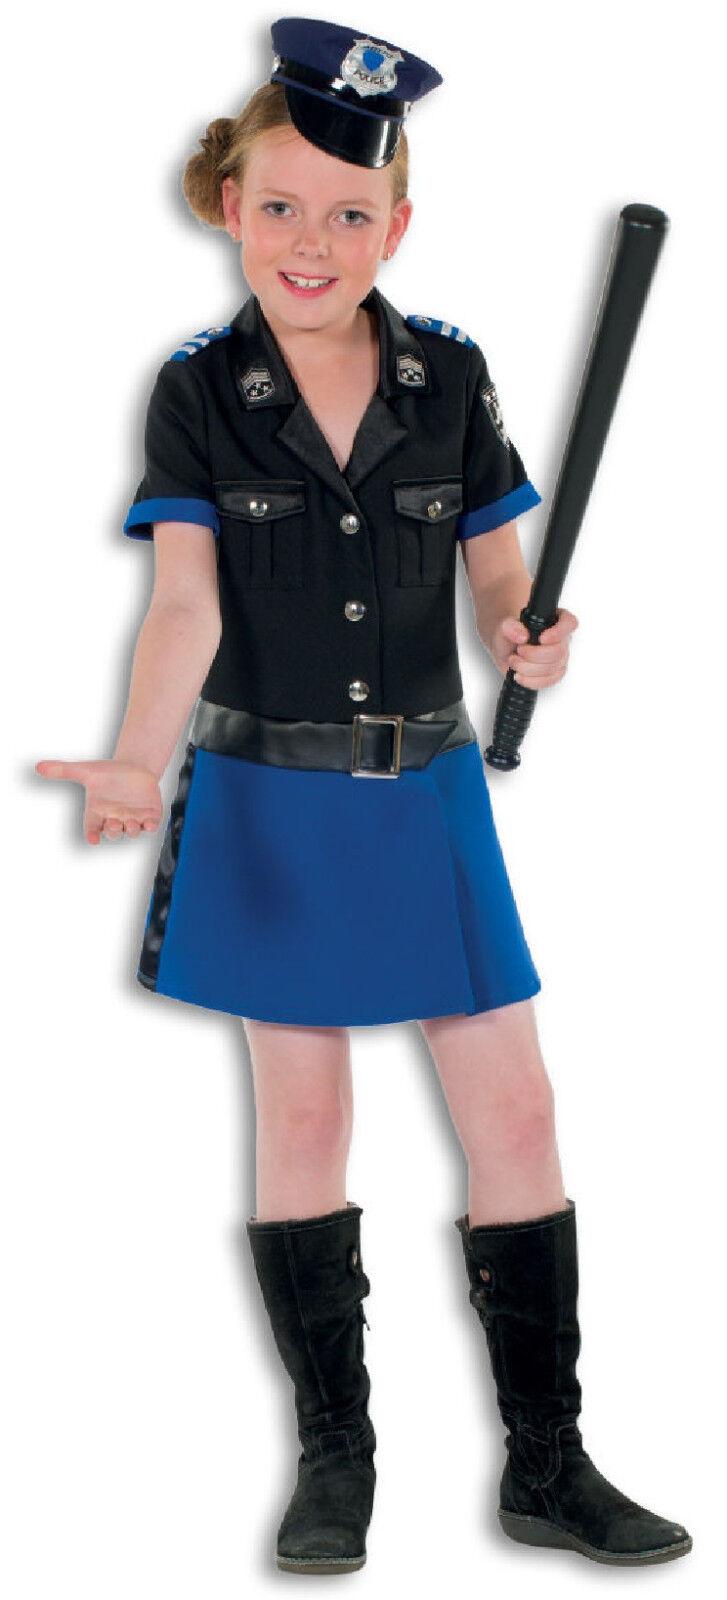 Policier sexy policière police costume robe uniform Femmes  s s s Filles FBI 08d25b